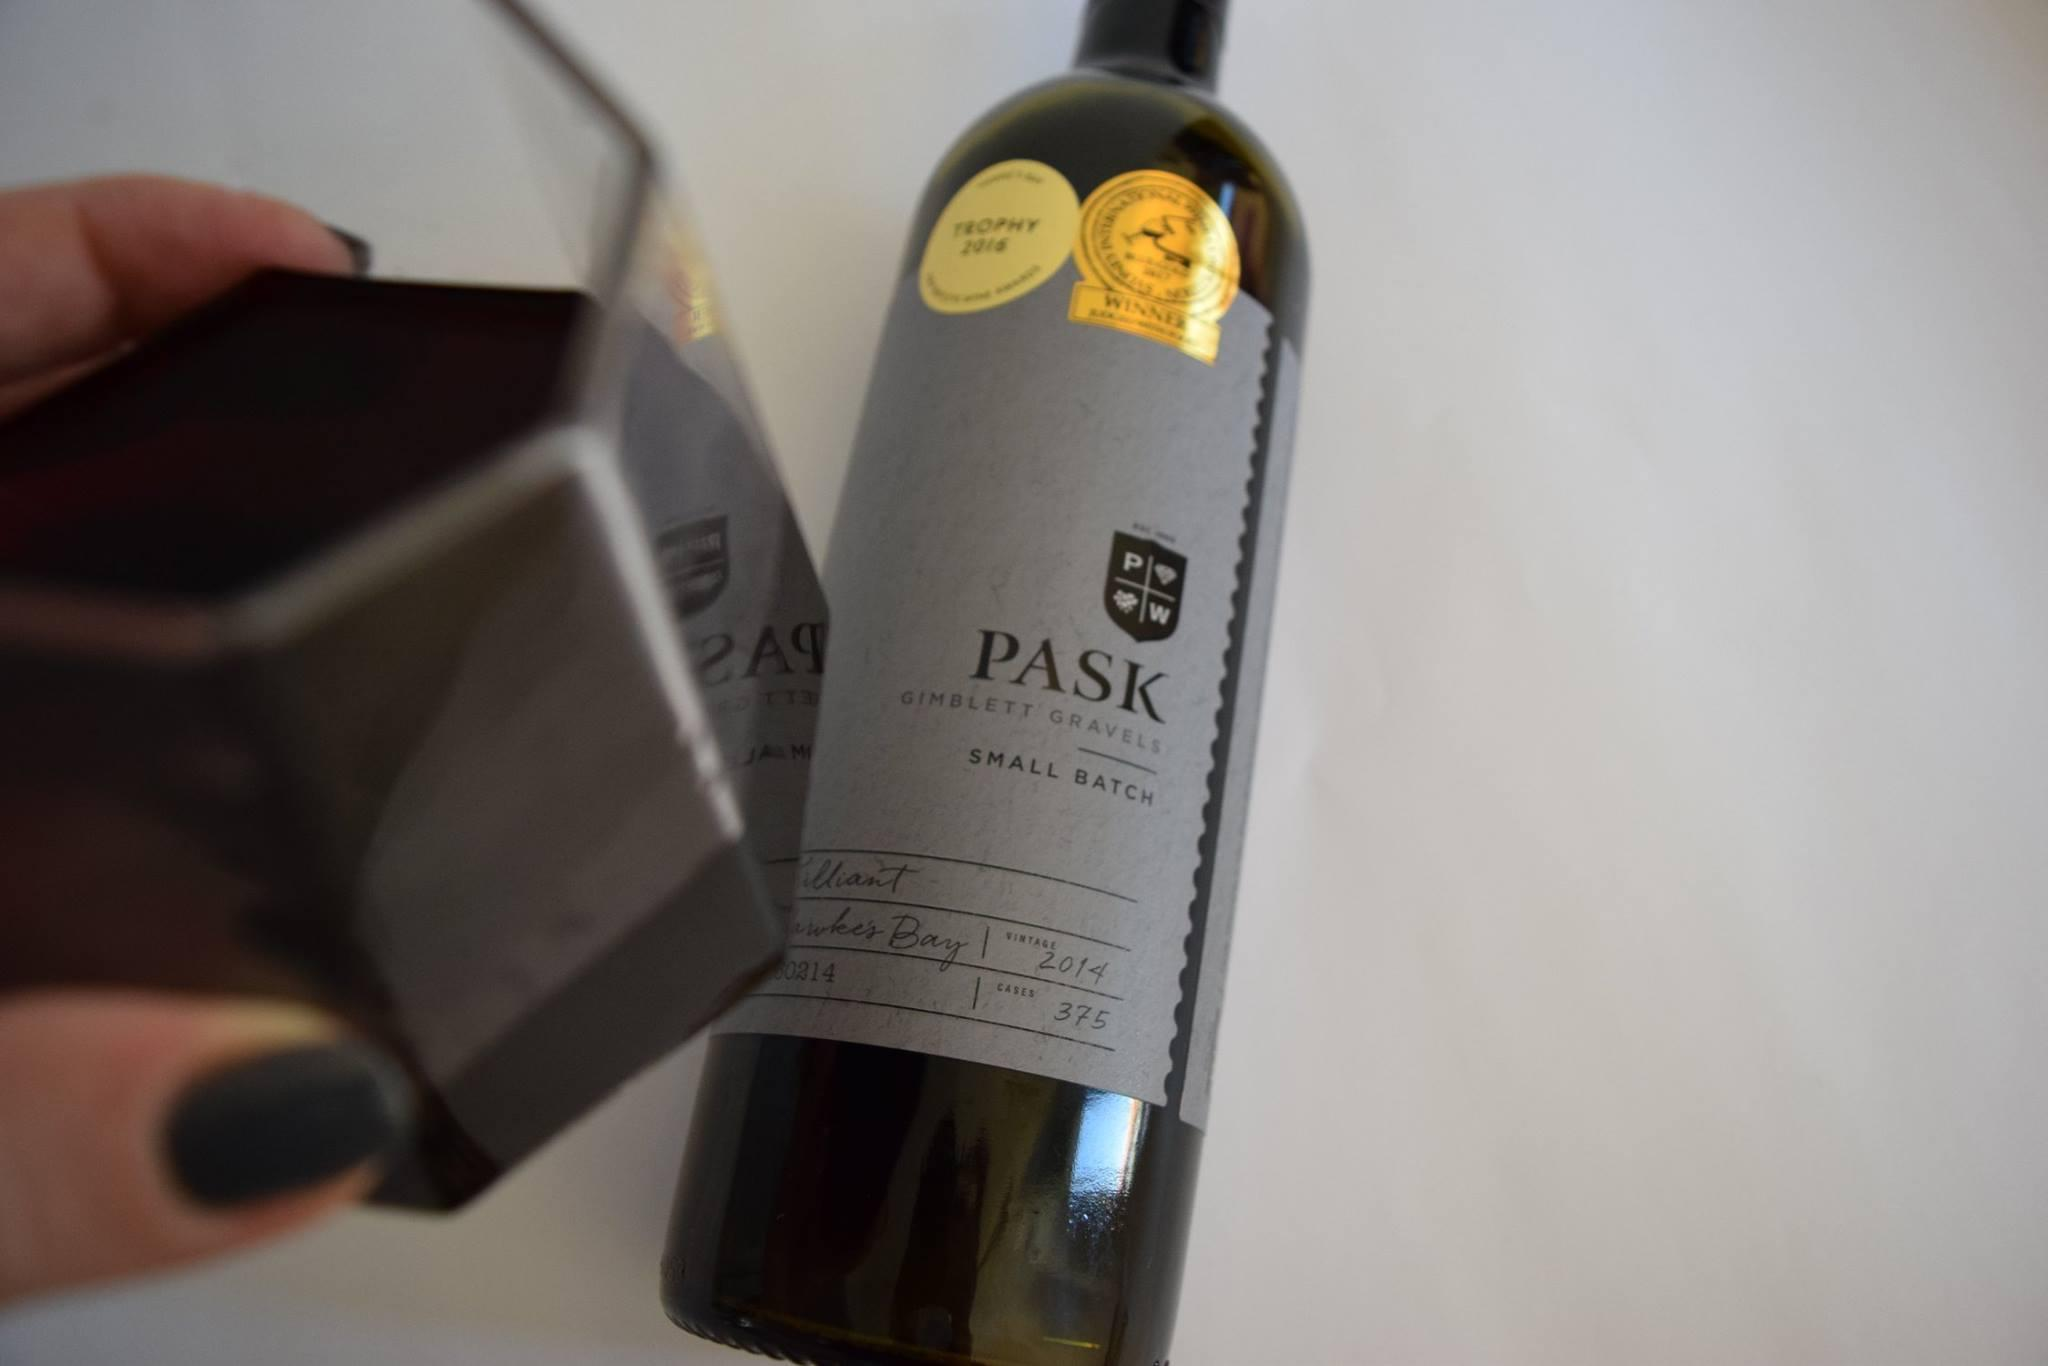 Pask Winery Ltd